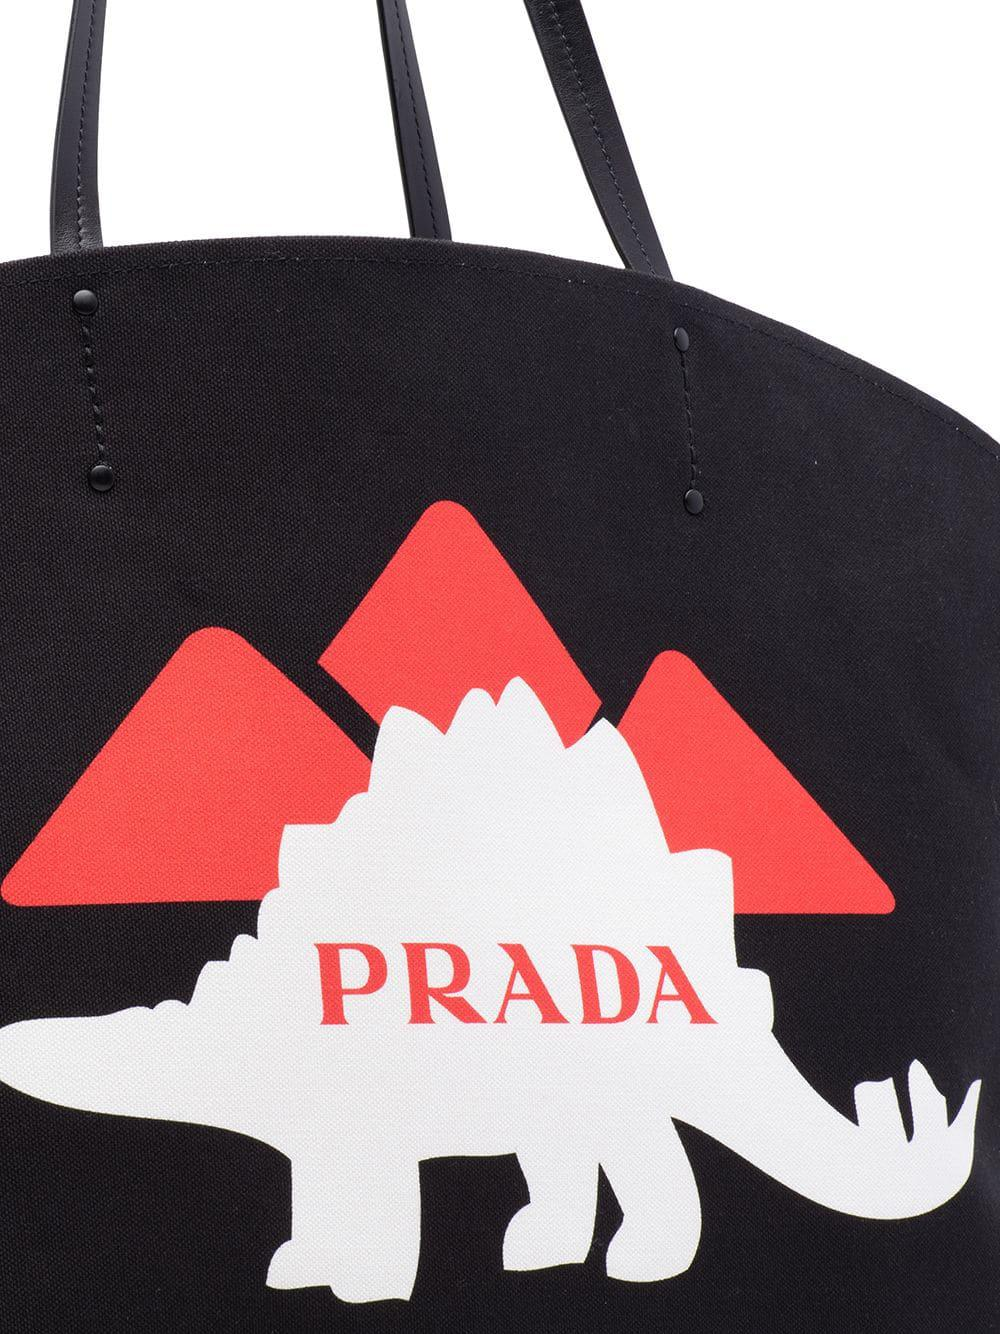 076686cdf51f Prada Dinosaur Printed Canvas Black Tote Bag in Black - Lyst